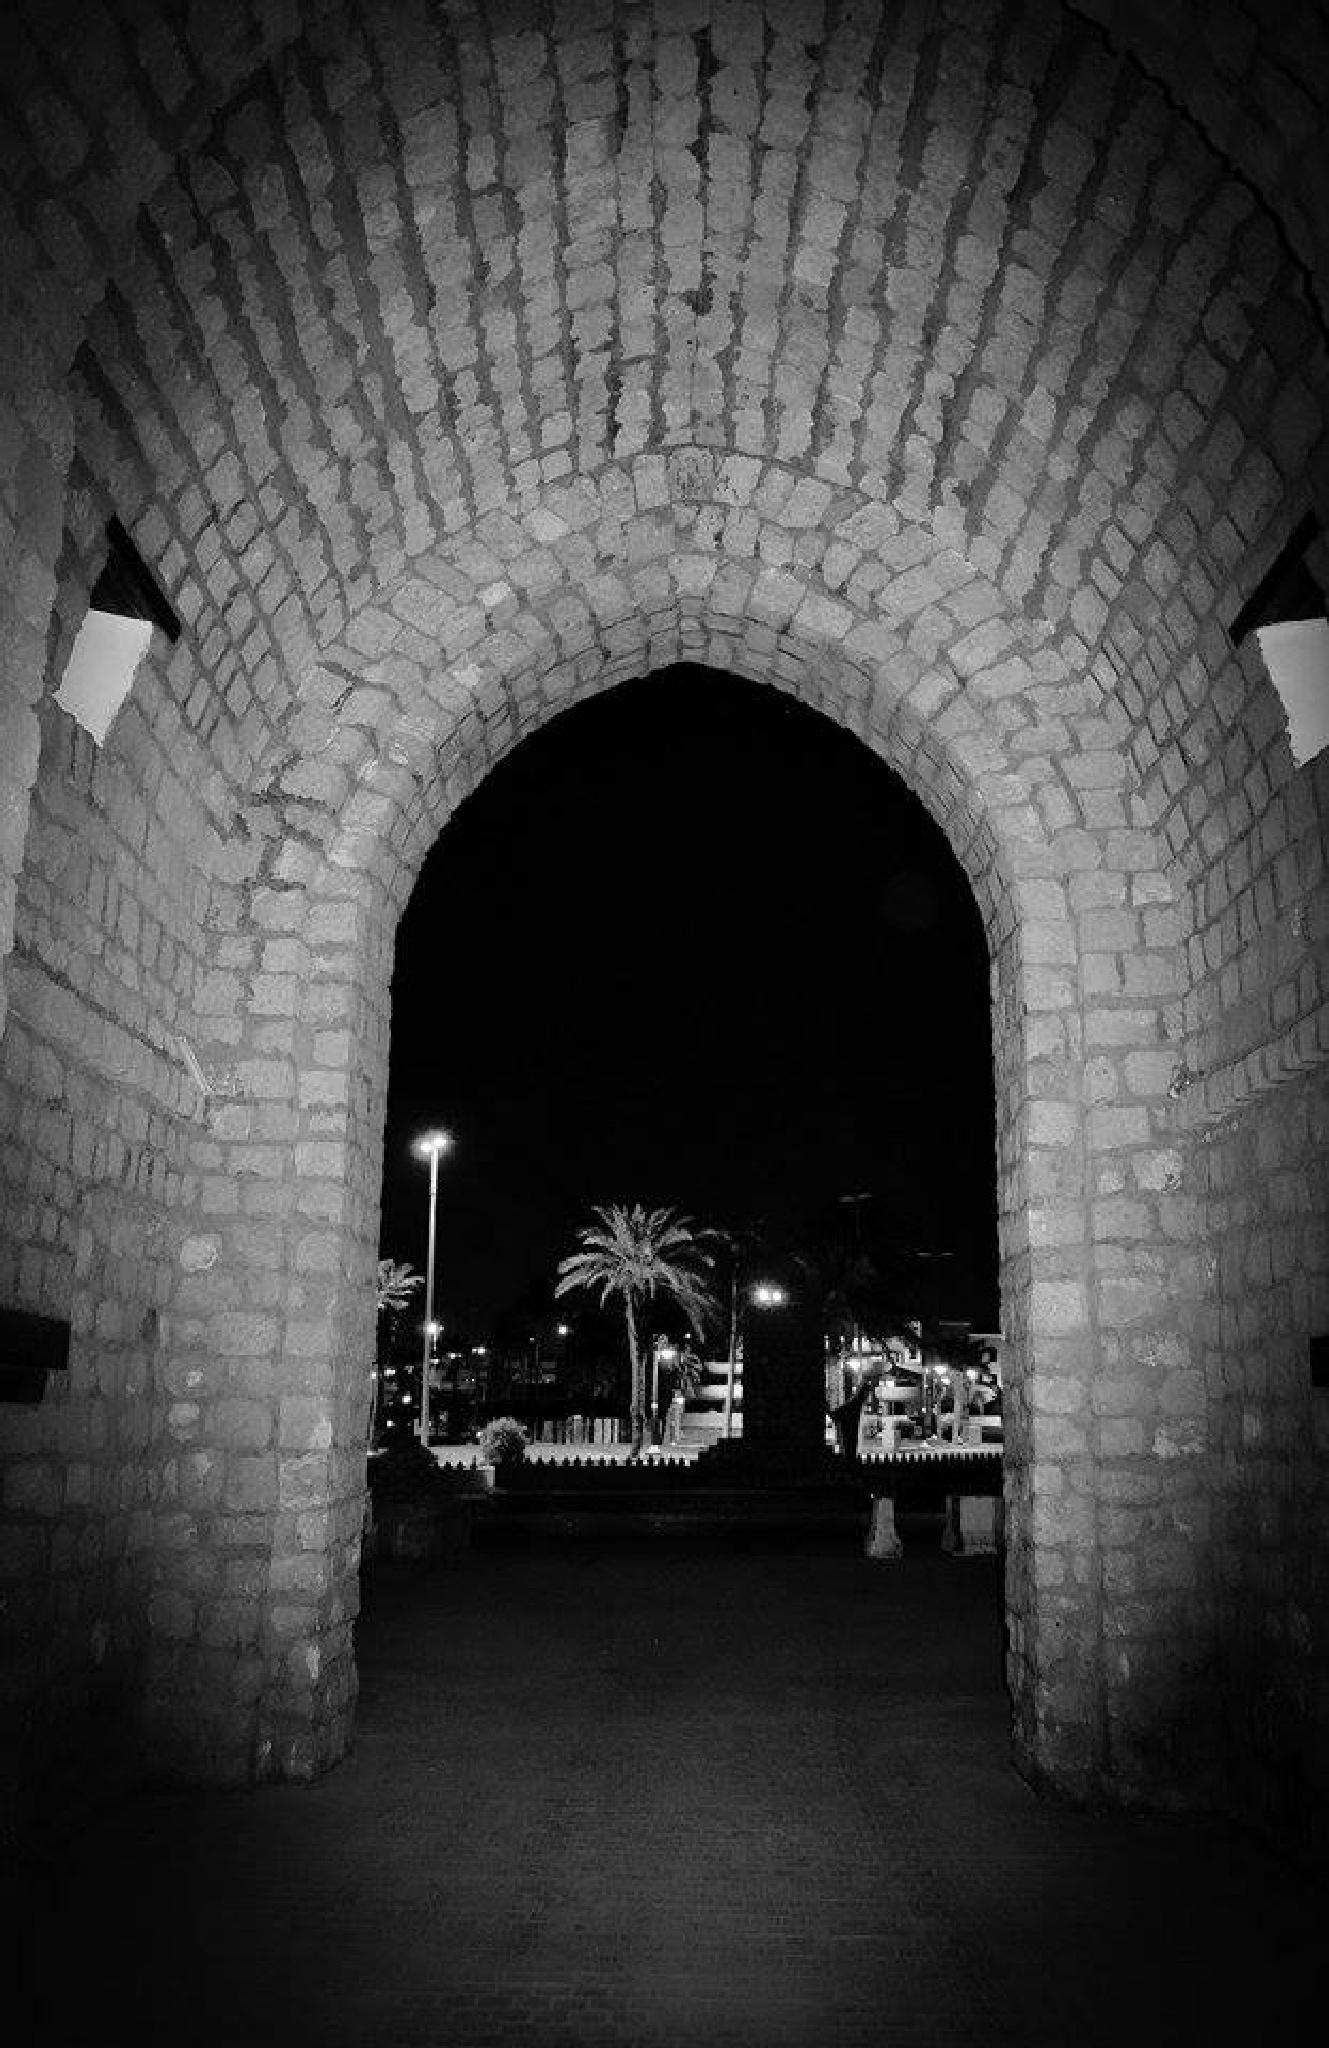 Untitled by Moustafa Ali Abd Elmanam